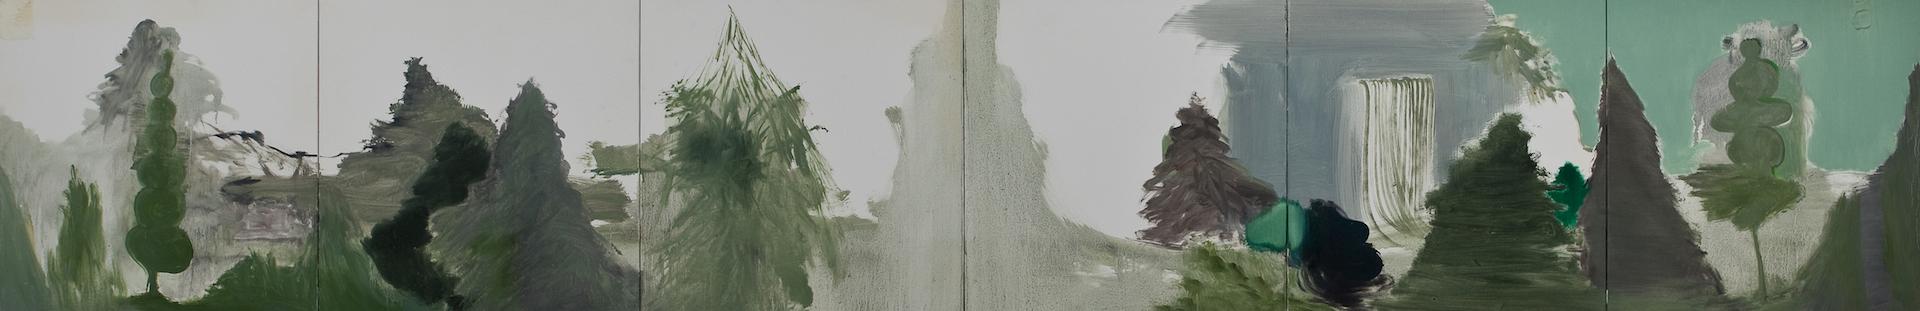 Module 01-06, 2011, oil on canvas,455.5x273cm